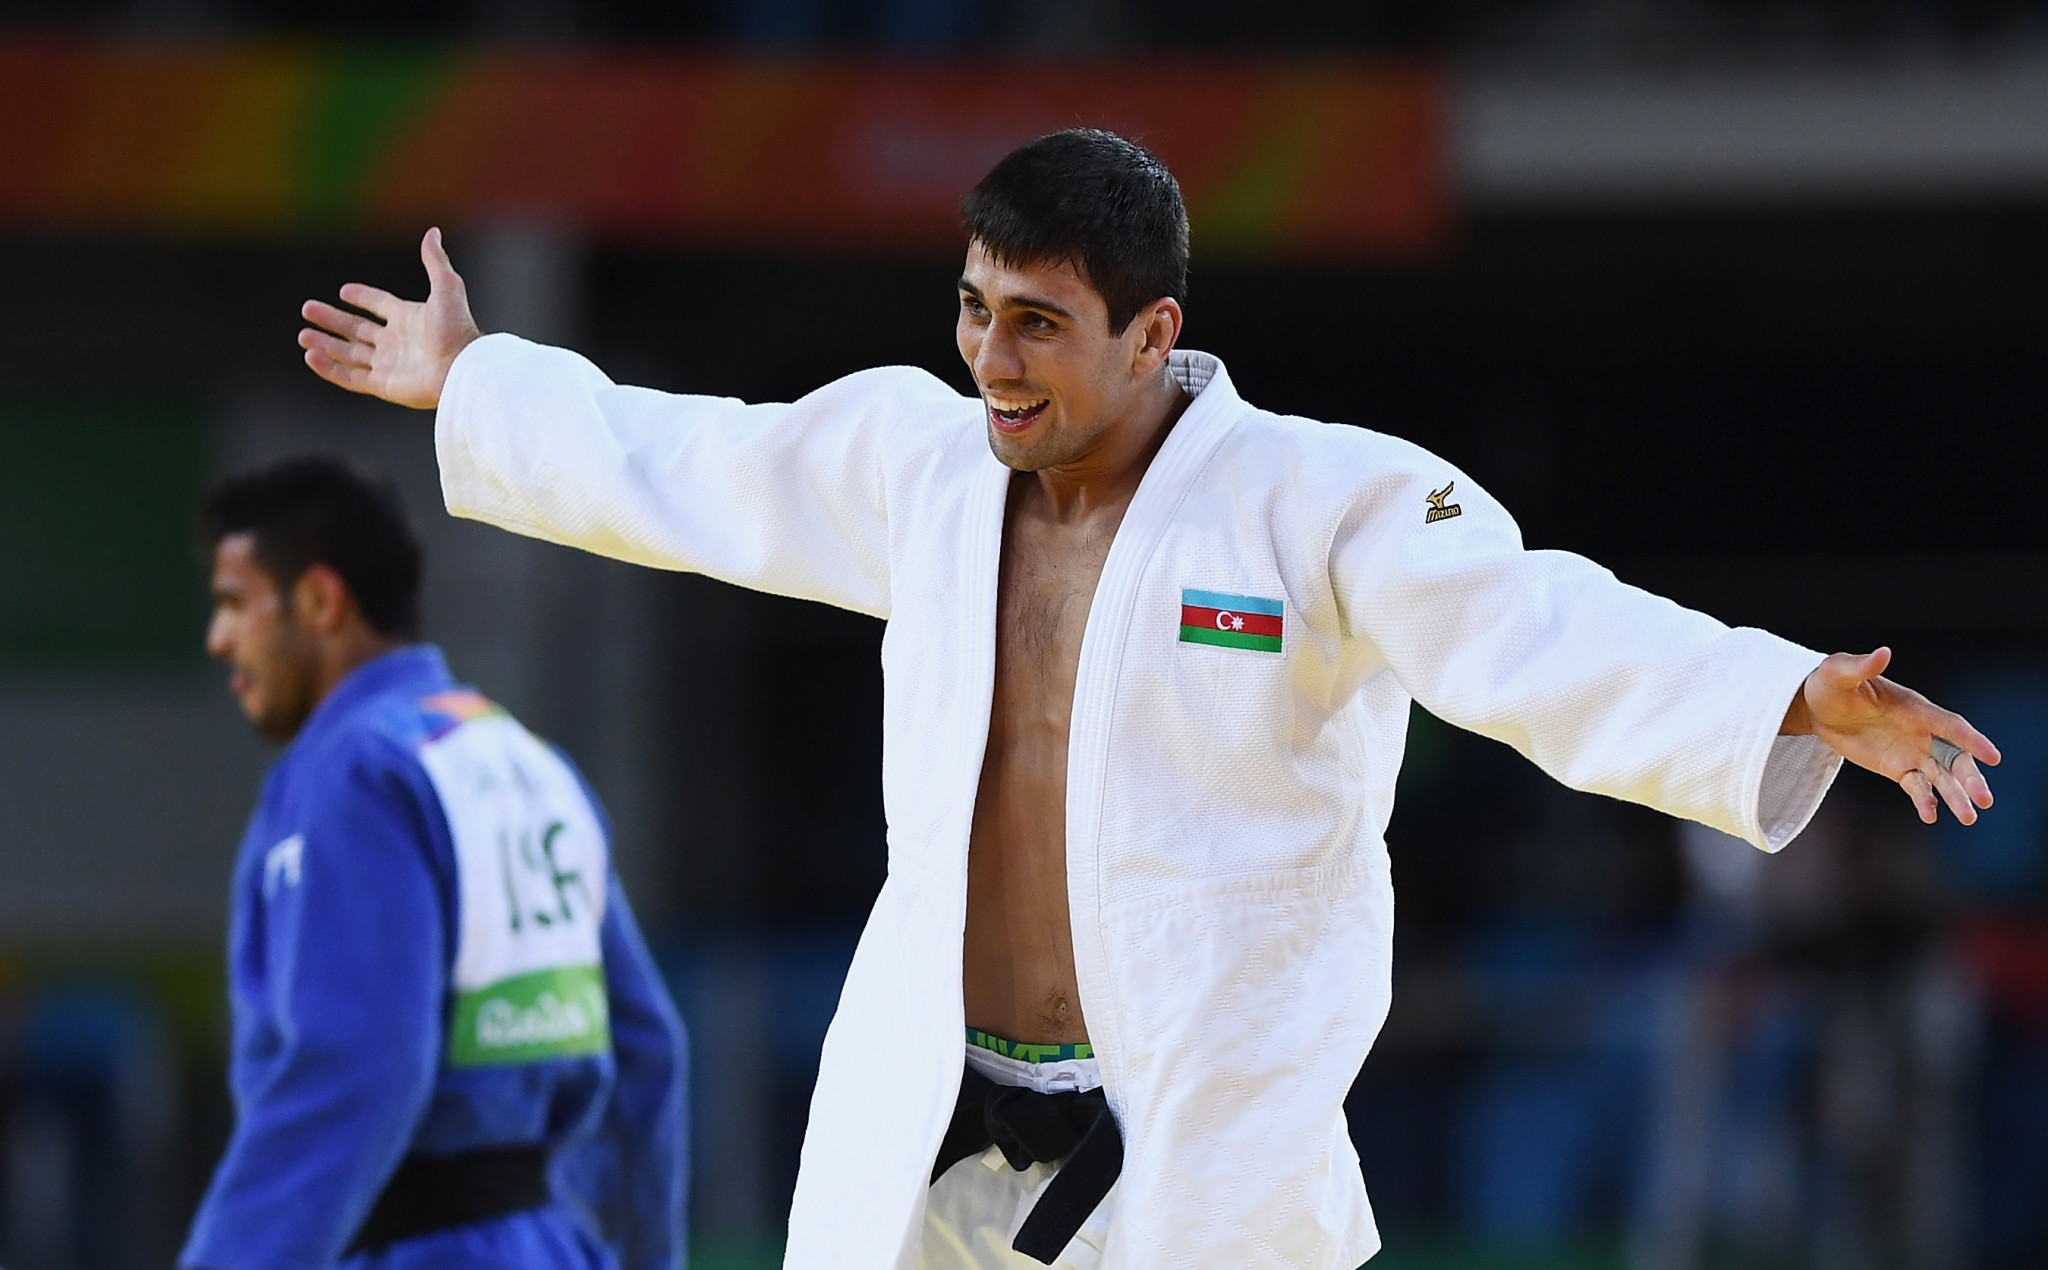 Judoka Orujov and taekwondo fighter Azizova named Azerbaijan flagbearers at Tokyo 2020